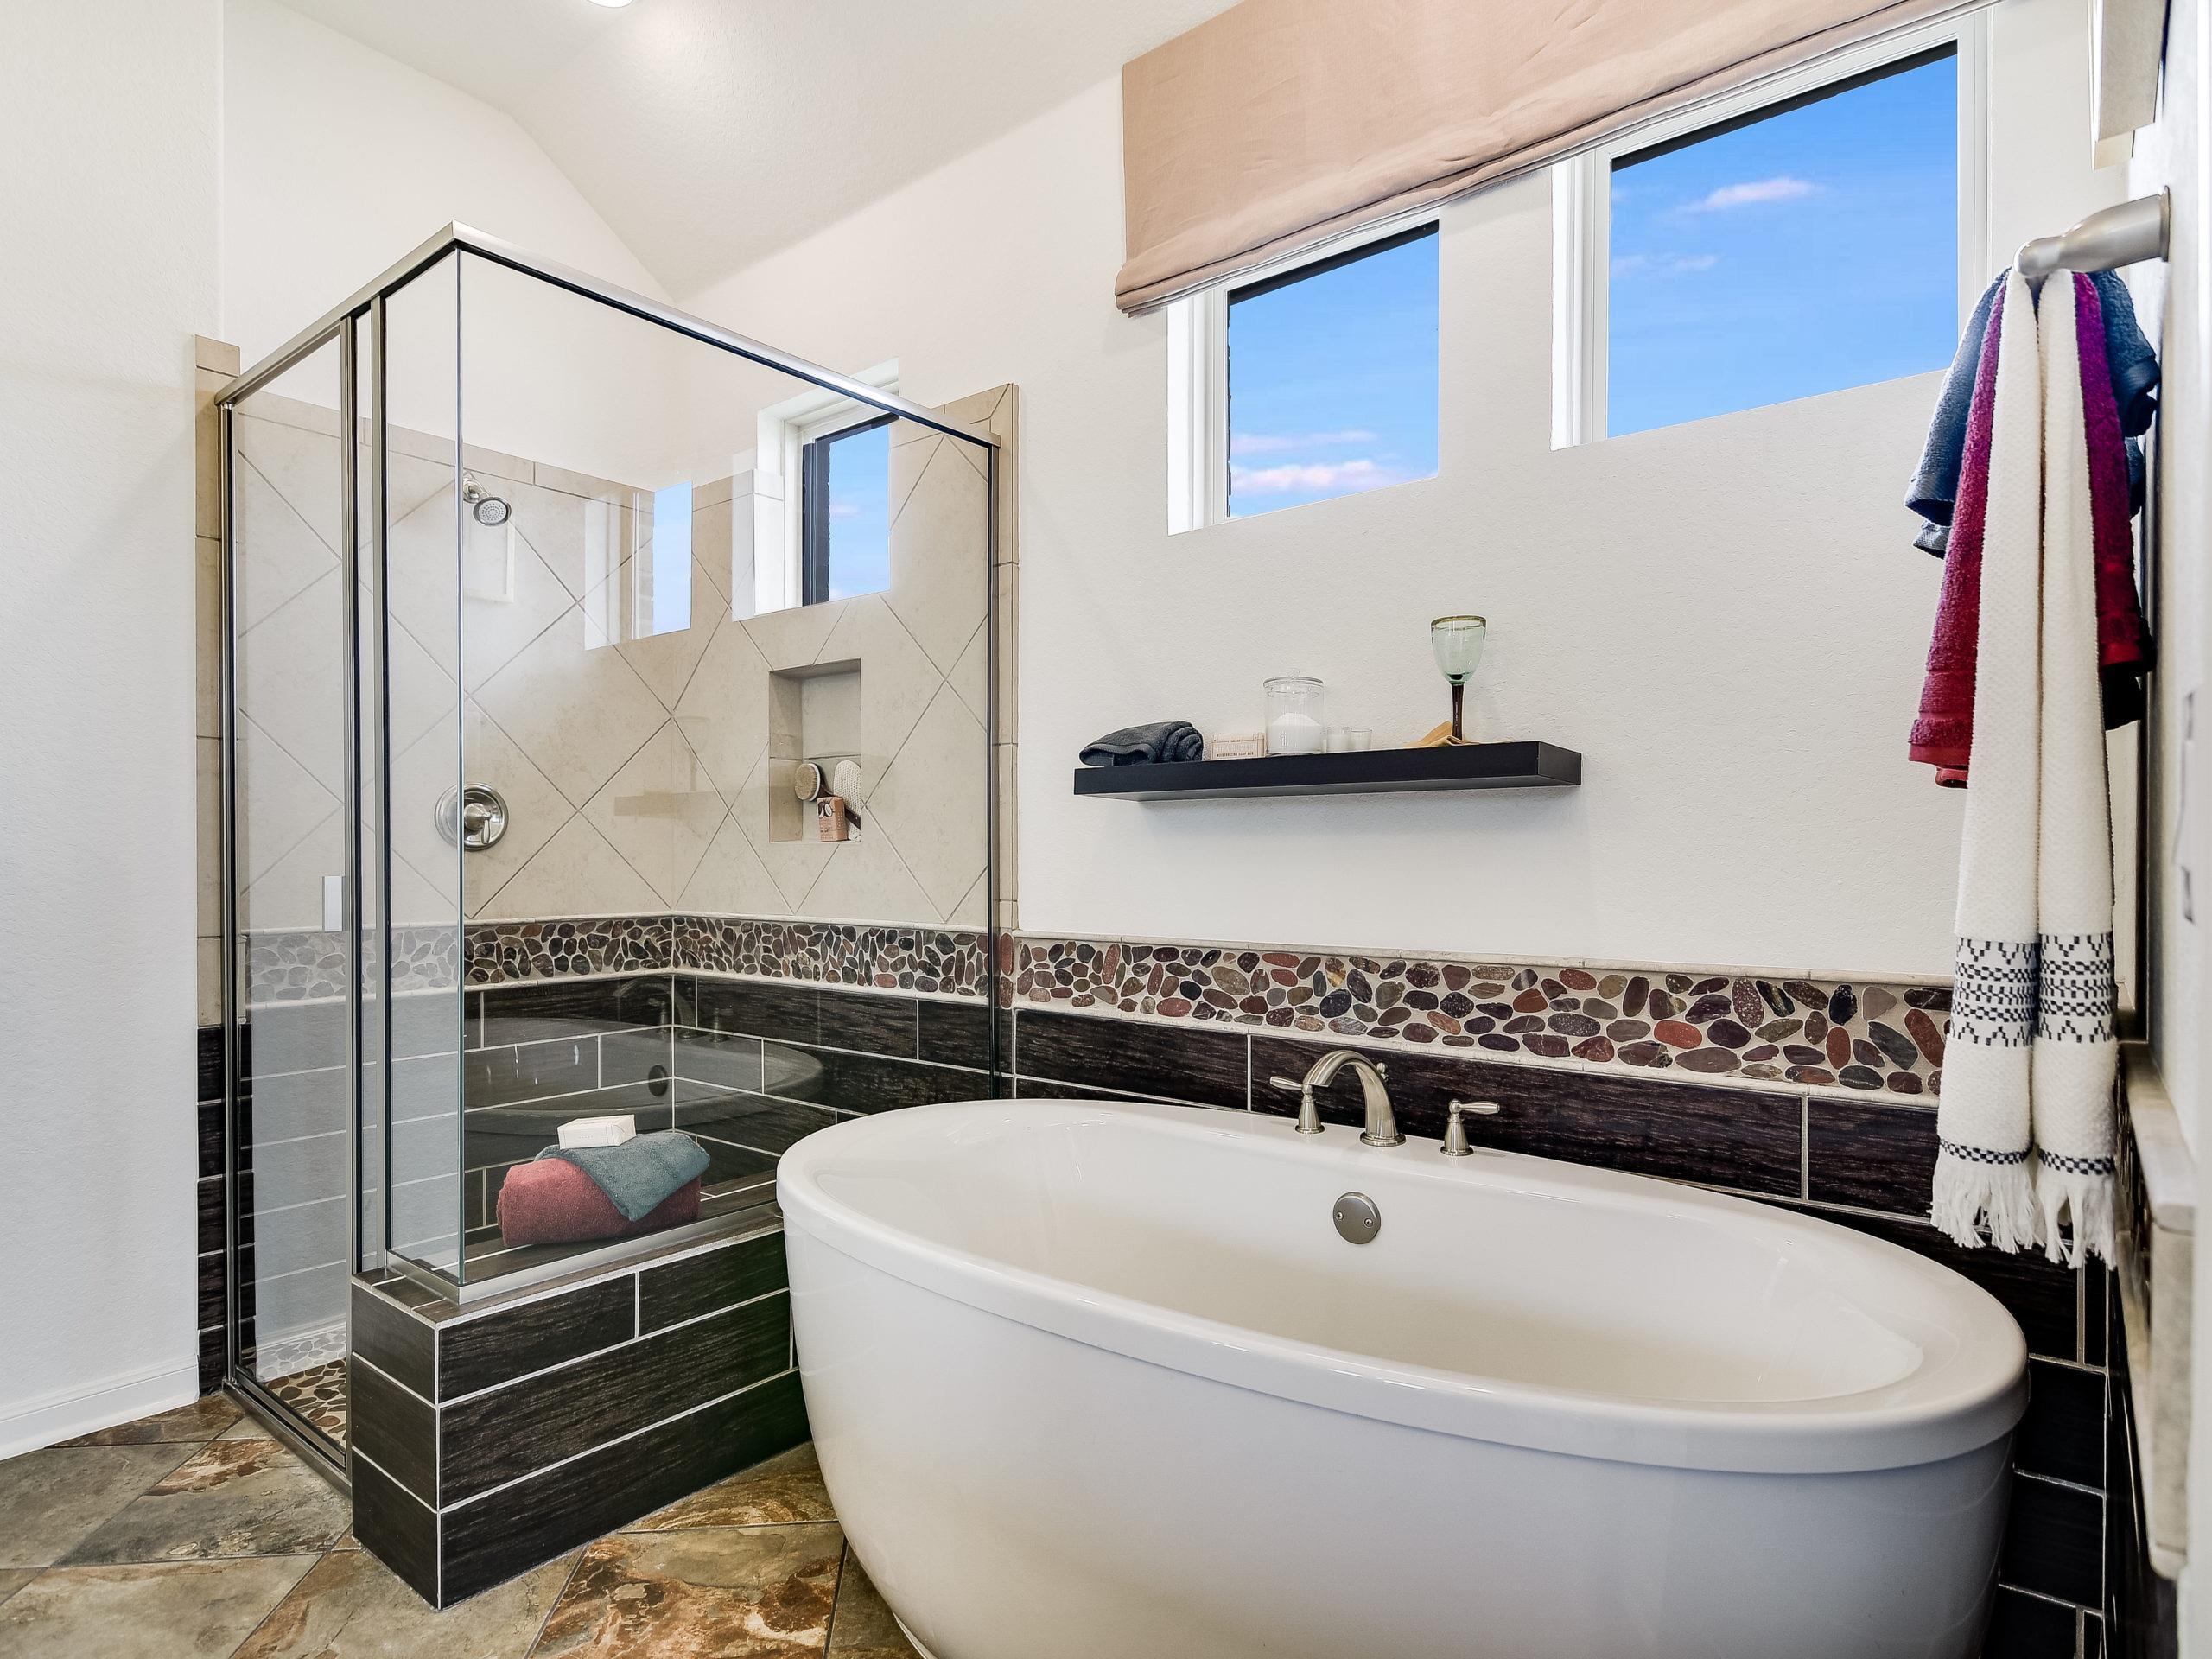 Bathroom featured in the Westwood By Sitterle Homes in San Antonio, TX